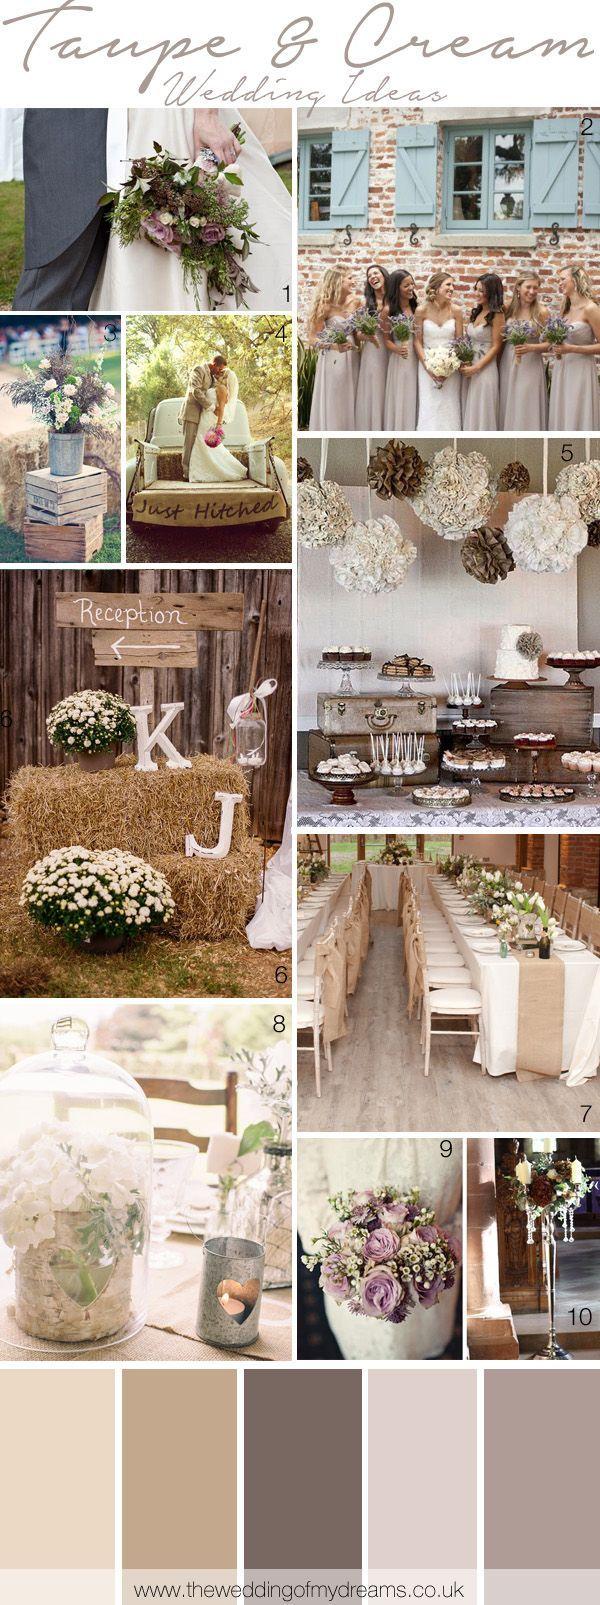 Cream and Taupe Wedding Inspiration and Ideas | www.endorajewellery.etsy.com - Custom Swarovski crystal jewelry